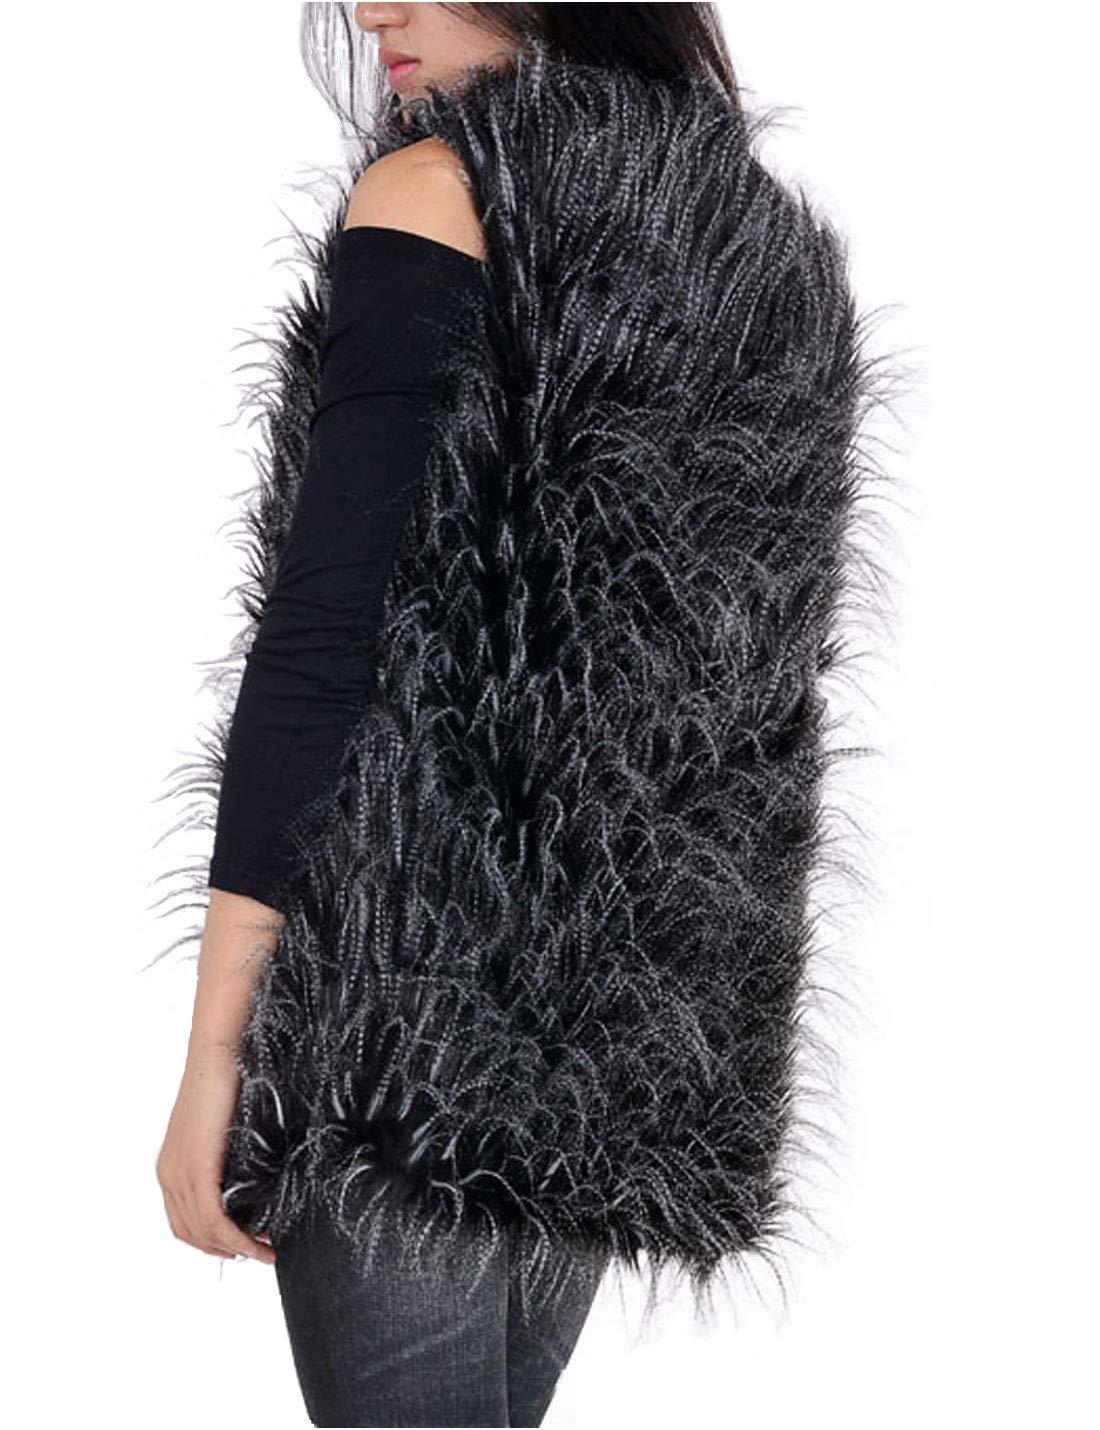 Flygo Women's Fashion Autumn Winter Warm Faux Fur Vests Sleeveless Jacket Waistcoat (XX-Large, Black Peacock Feather)